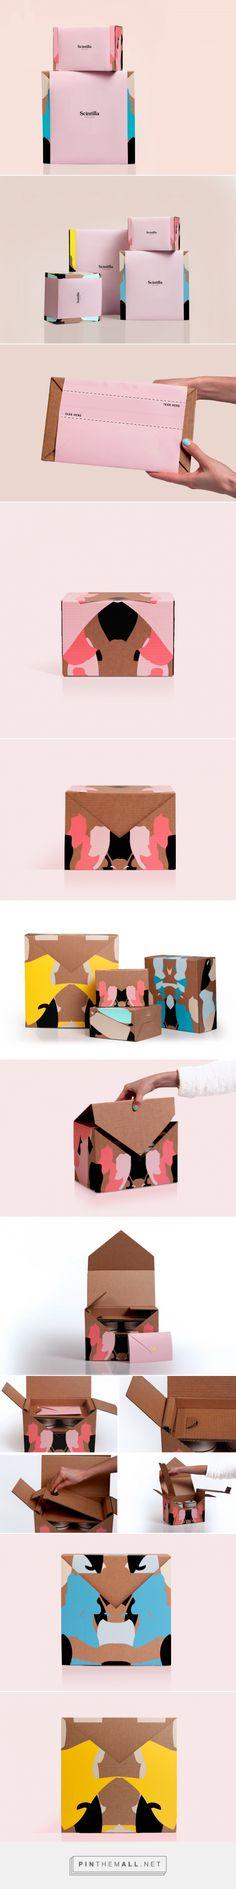 Scintilla Home Accessories Packaging by Milja Korpela   Fivestar Branding Agency – Design and Branding Agency & Curated Inspiration Gallery